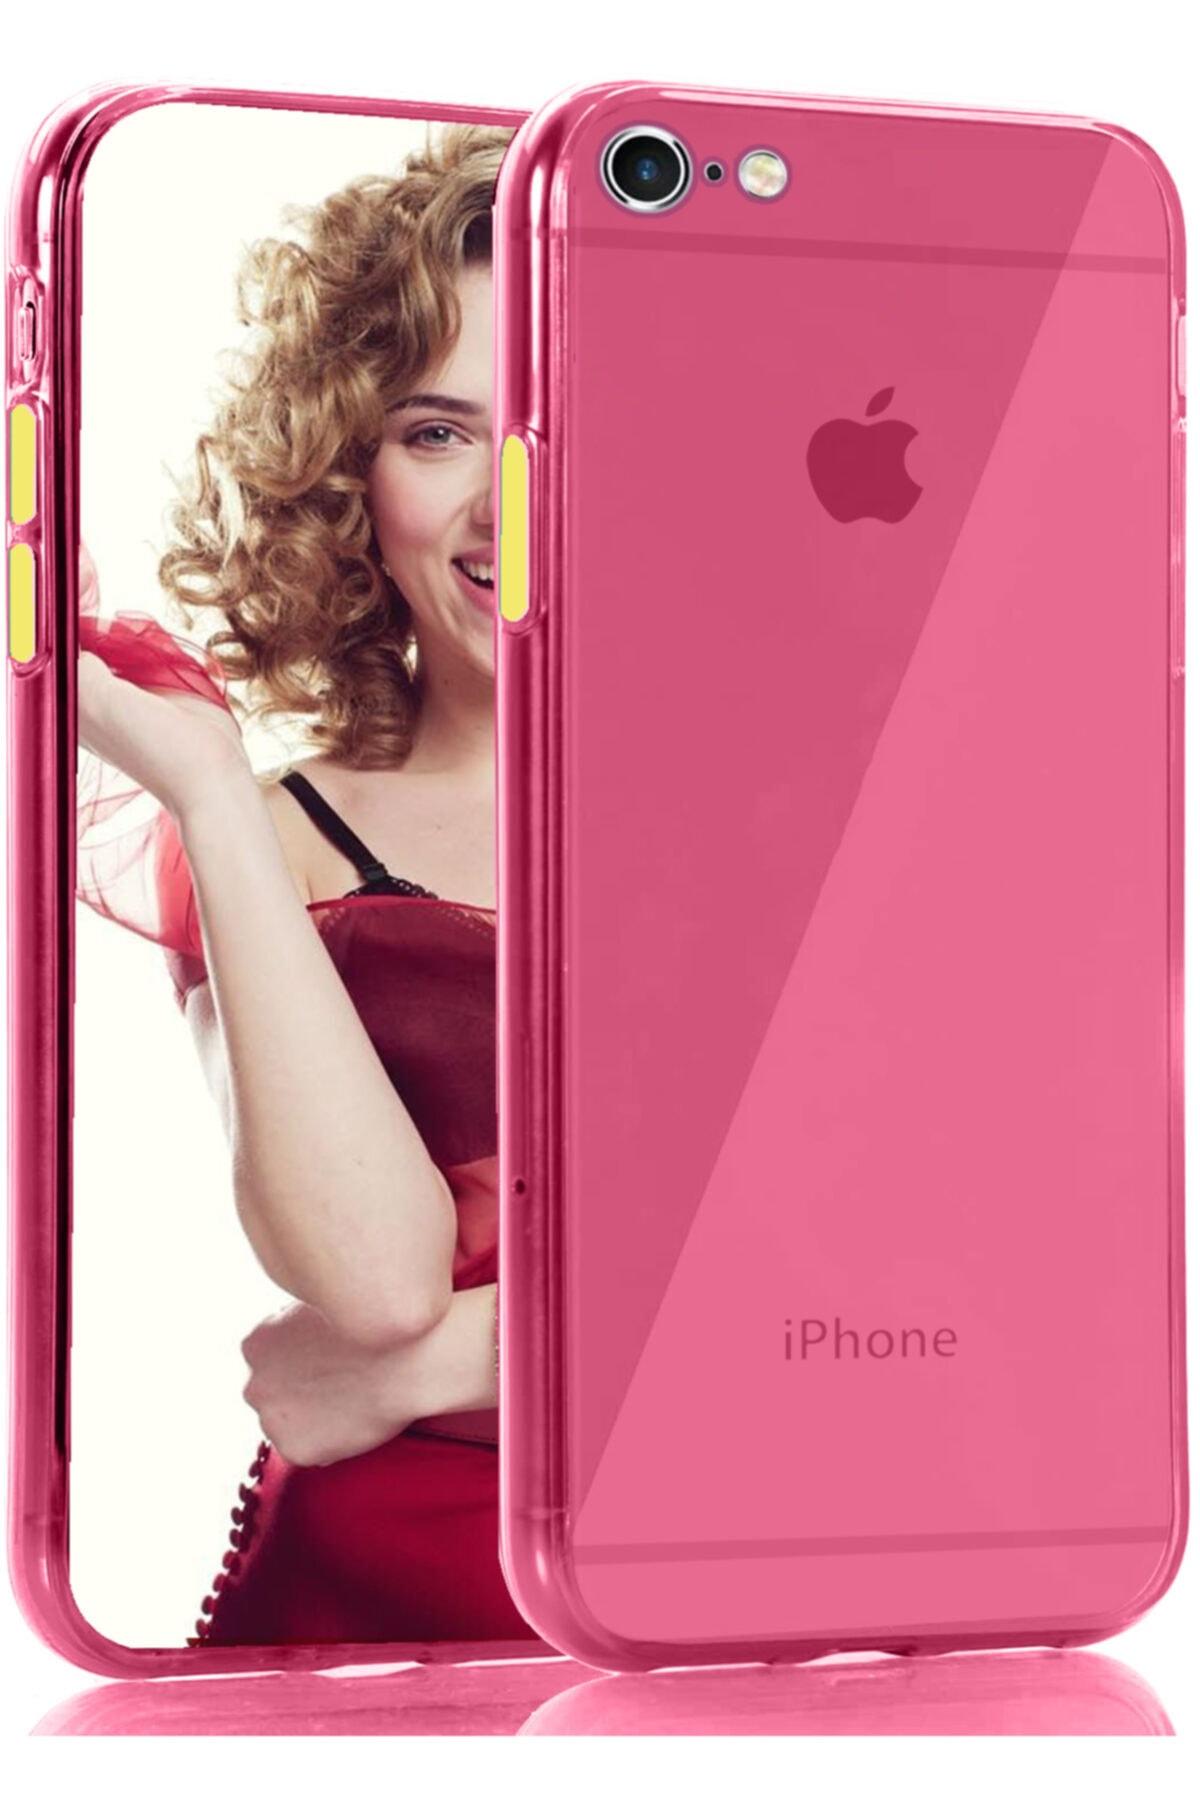 zore Apple Iphone 8 Kılıf Pastel Renkli Esnek Ince Şeffaf Kapak 1